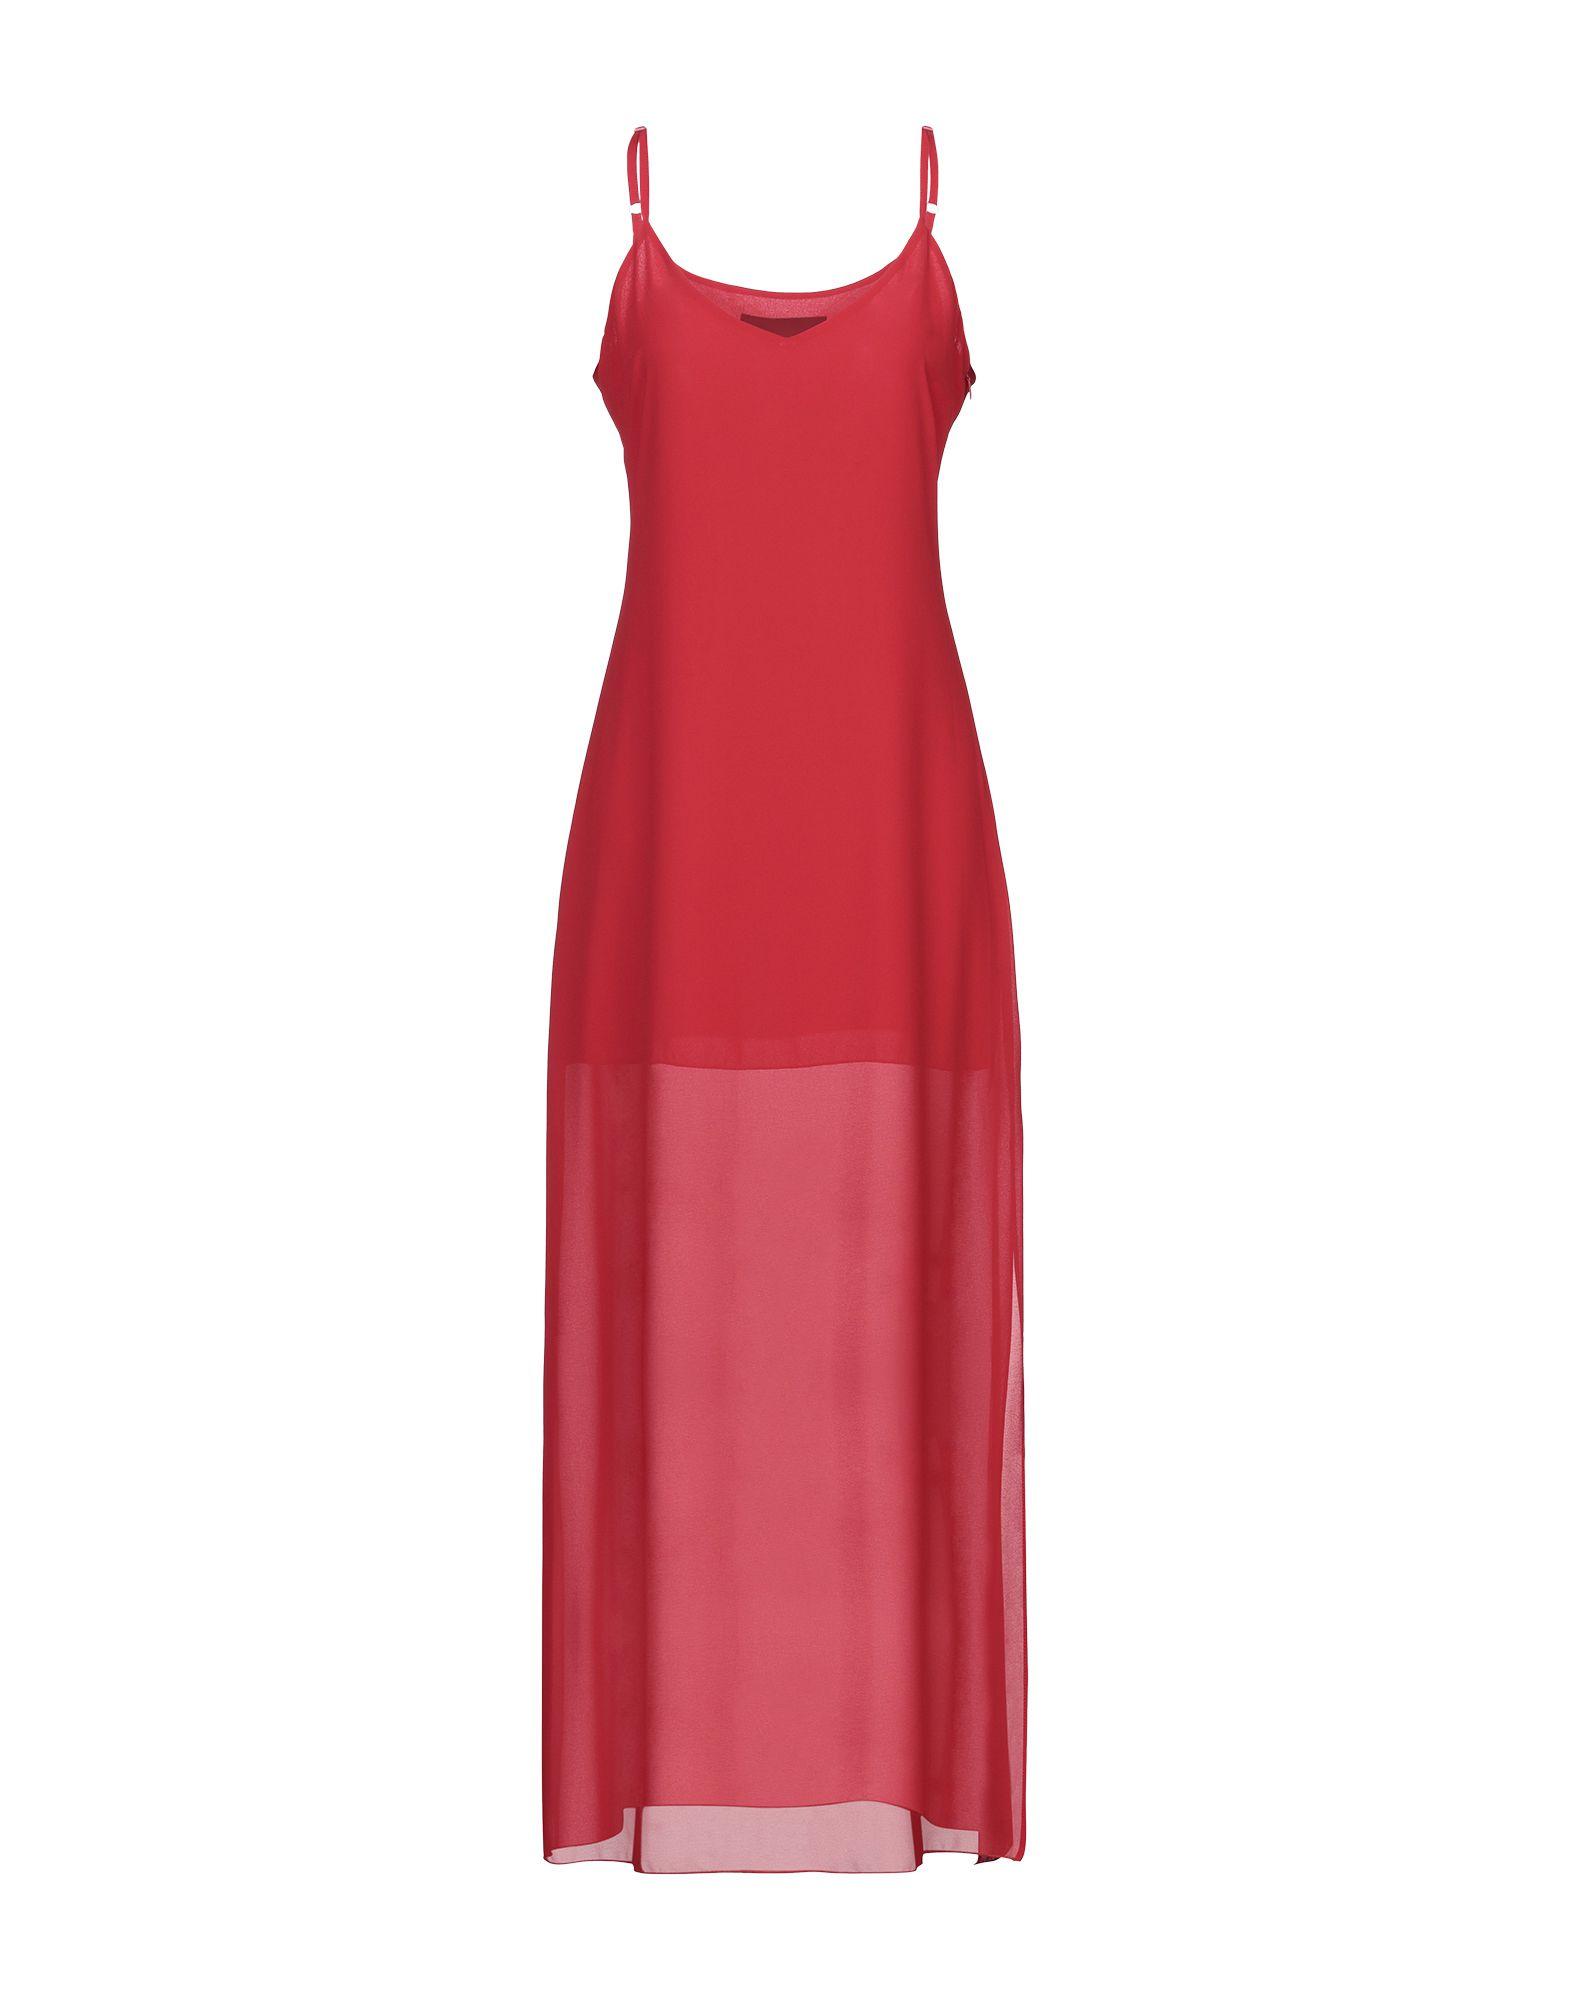 SANDRO FERRONE Длинное платье